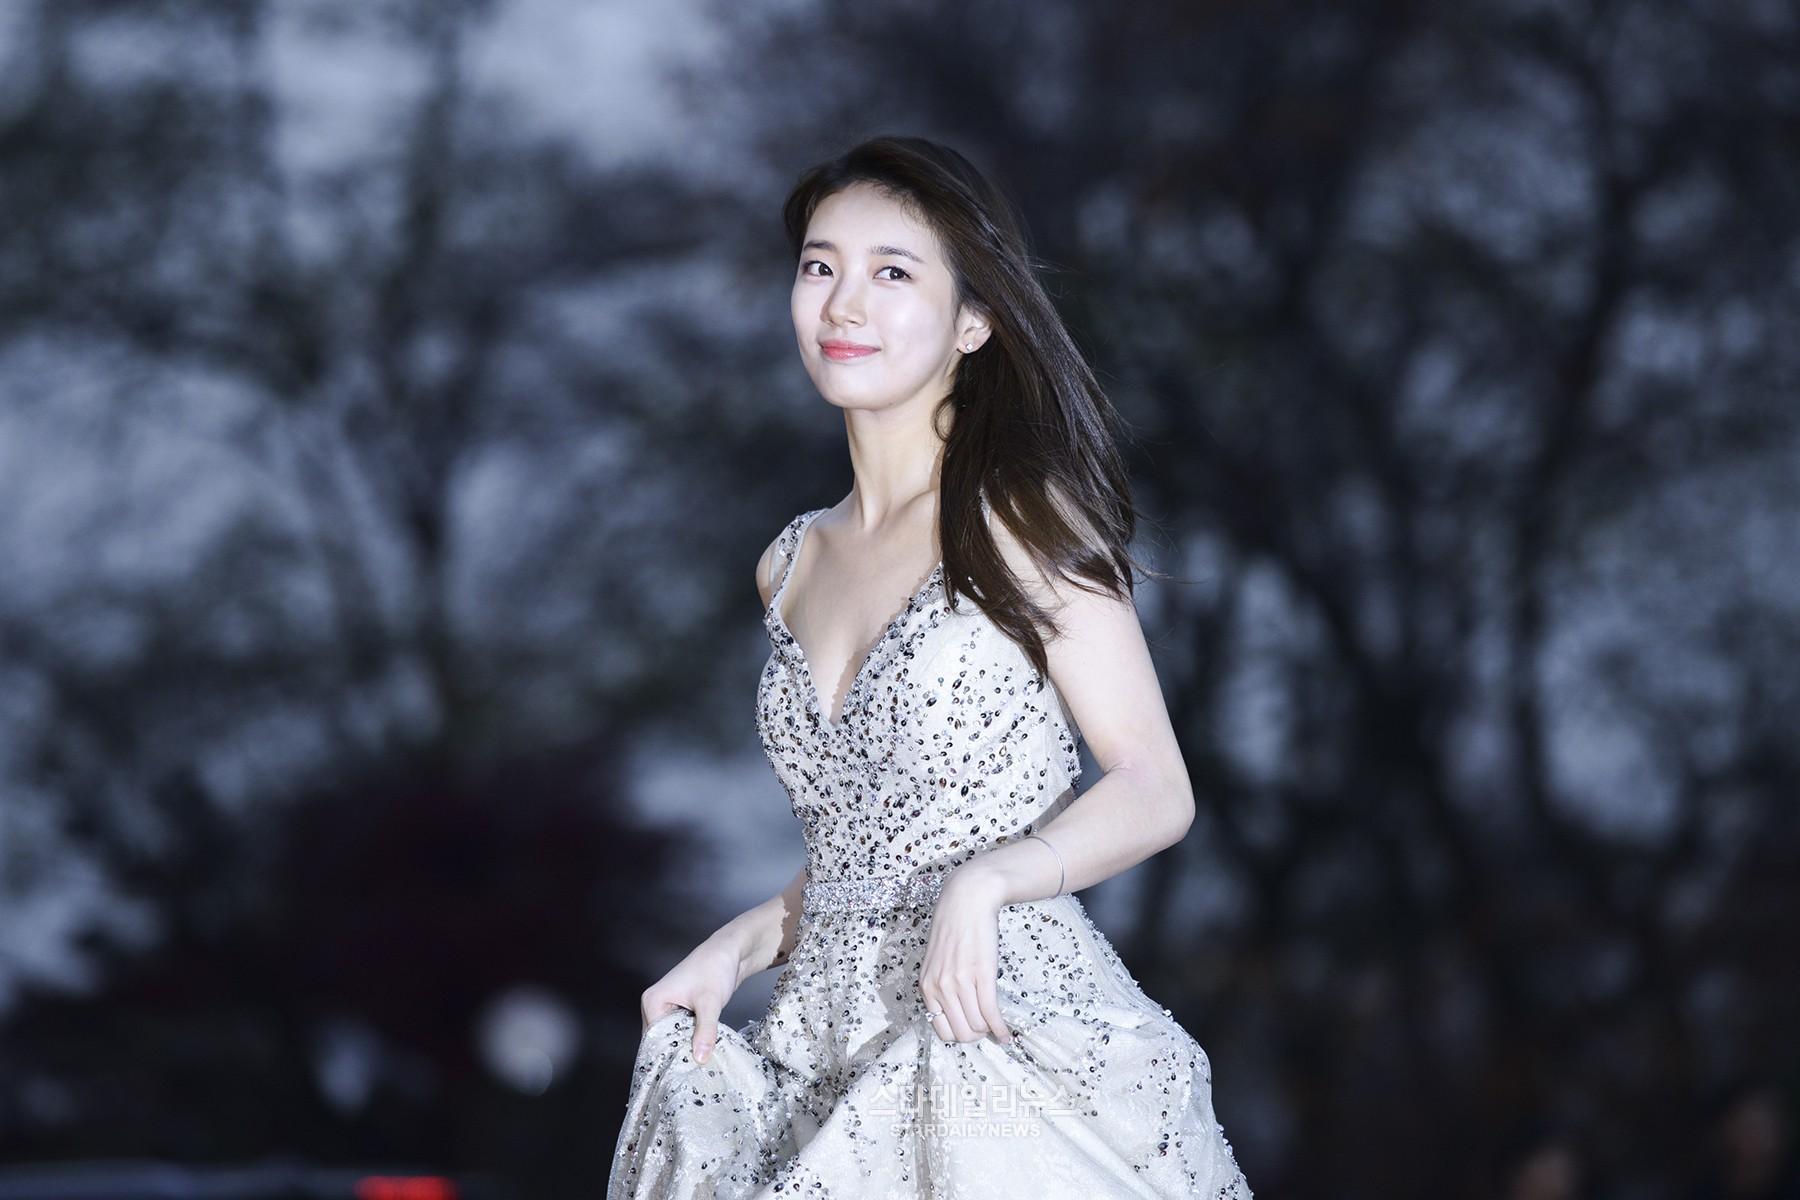 Dynamic Girl Wallpaper K Pop And K Drama Stars Shine At 2016 Asia Artist Awards